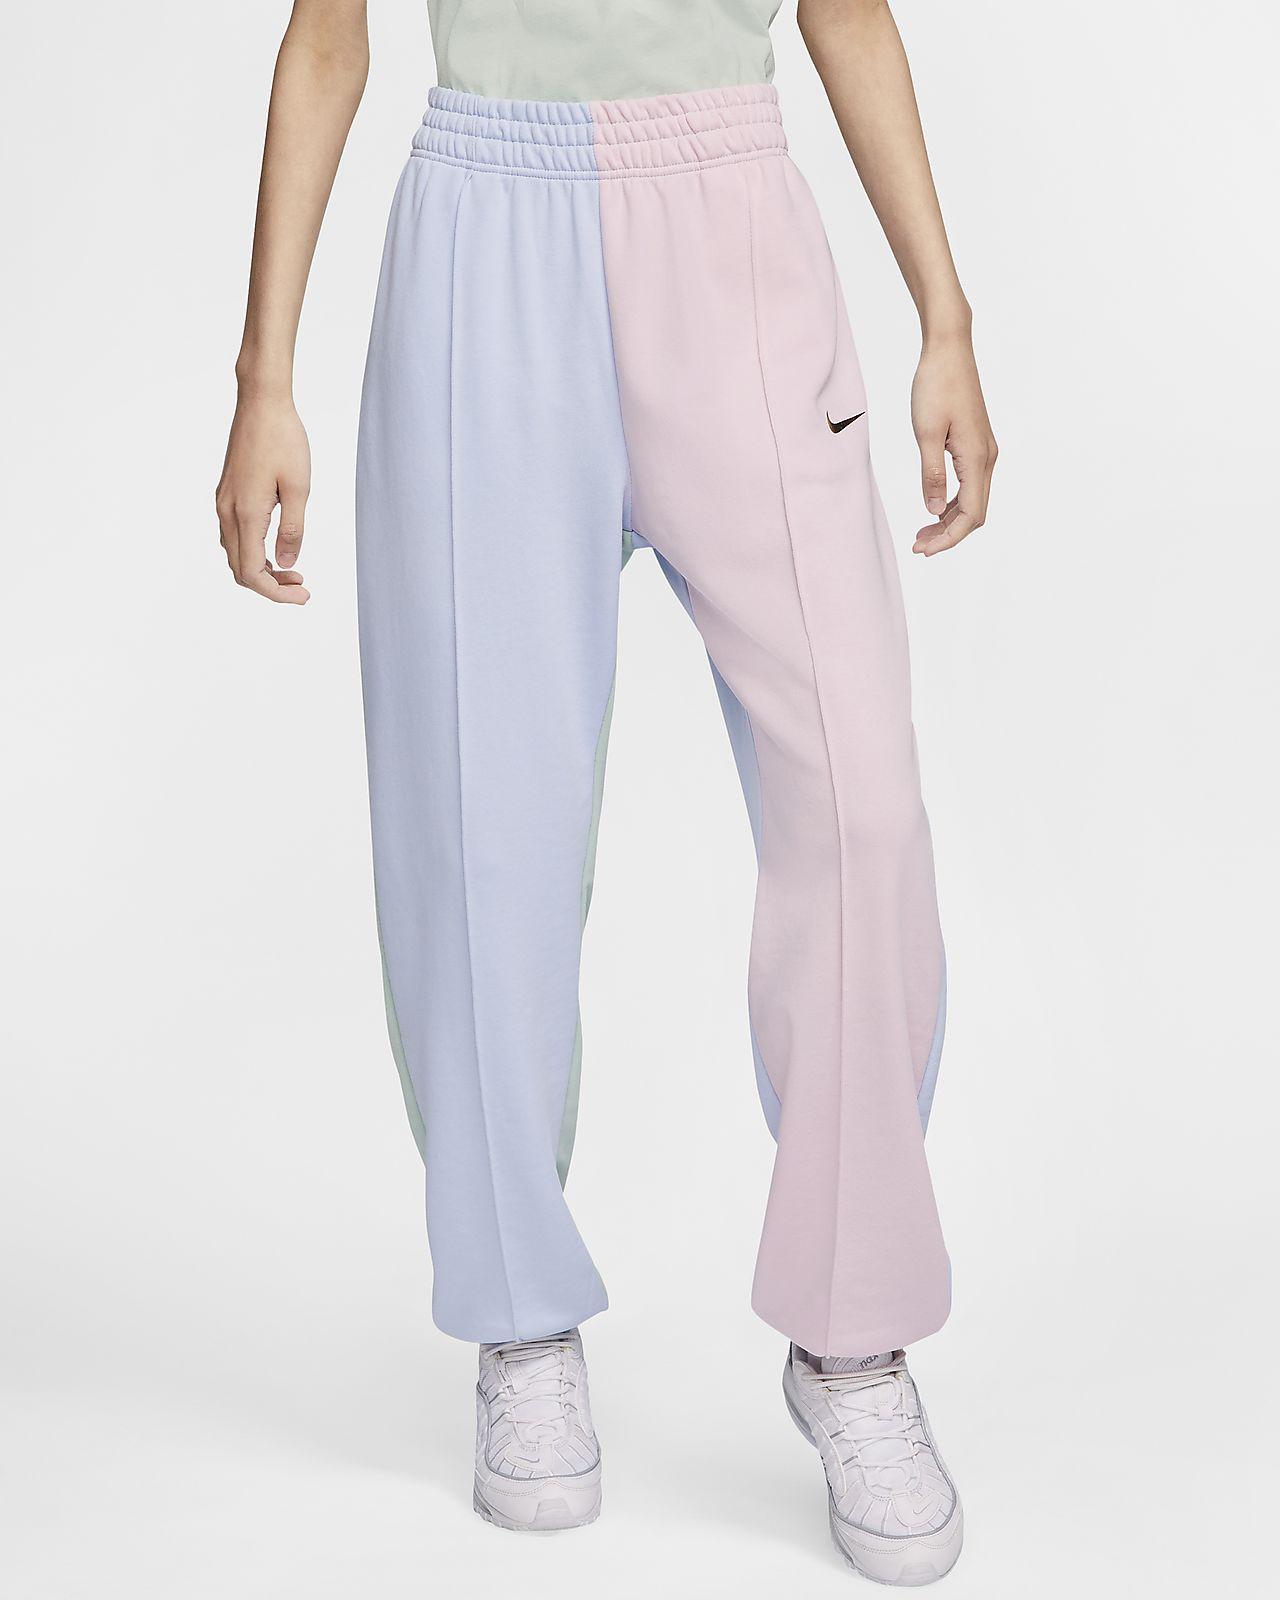 pantalon nike femme